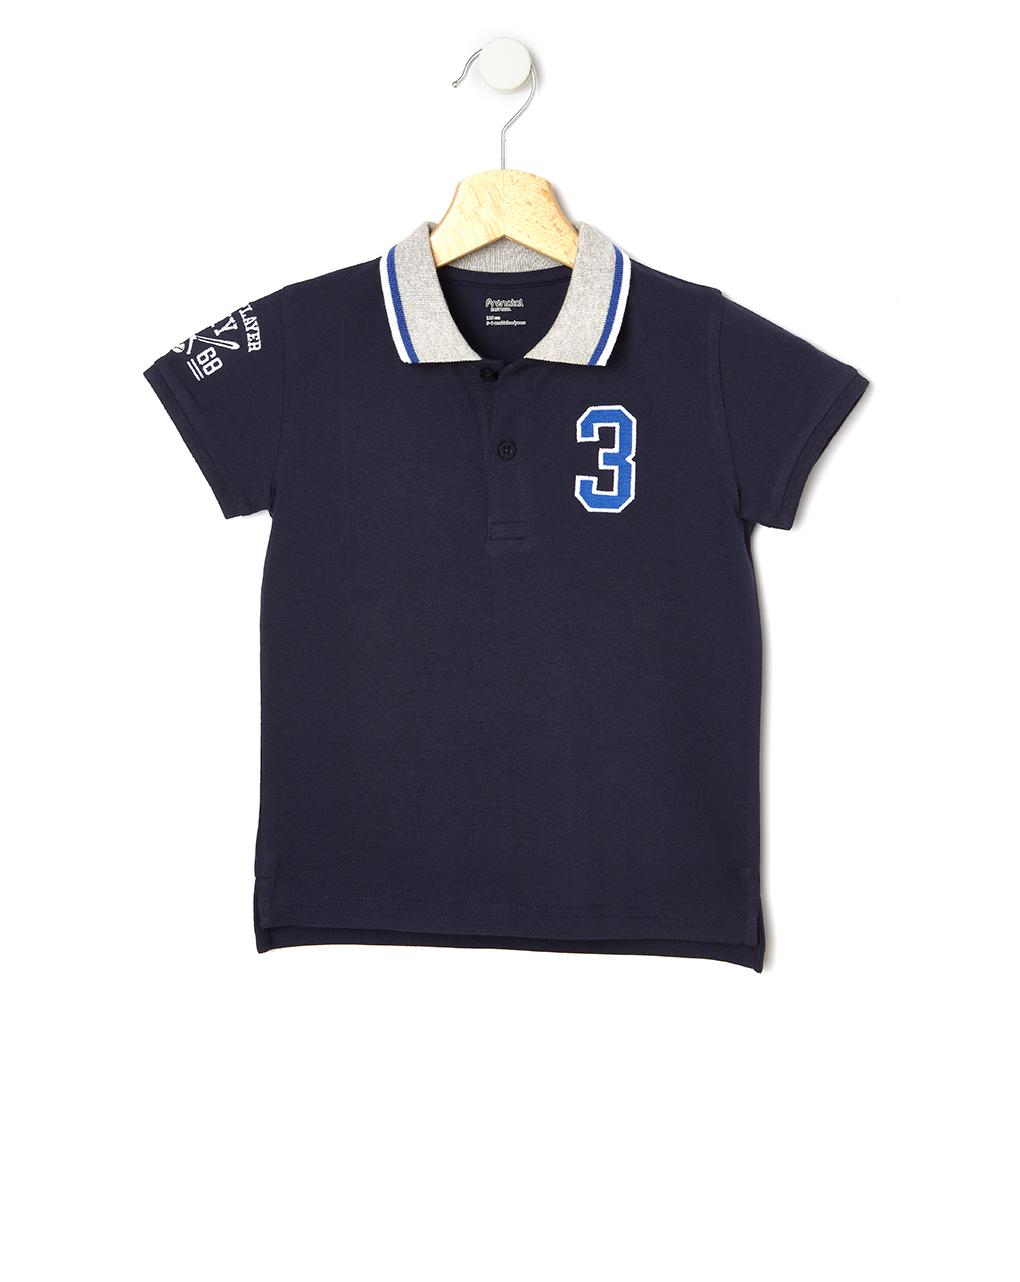 Mπλούζα Πόλο Πικέ Μπλε για Αγόρι